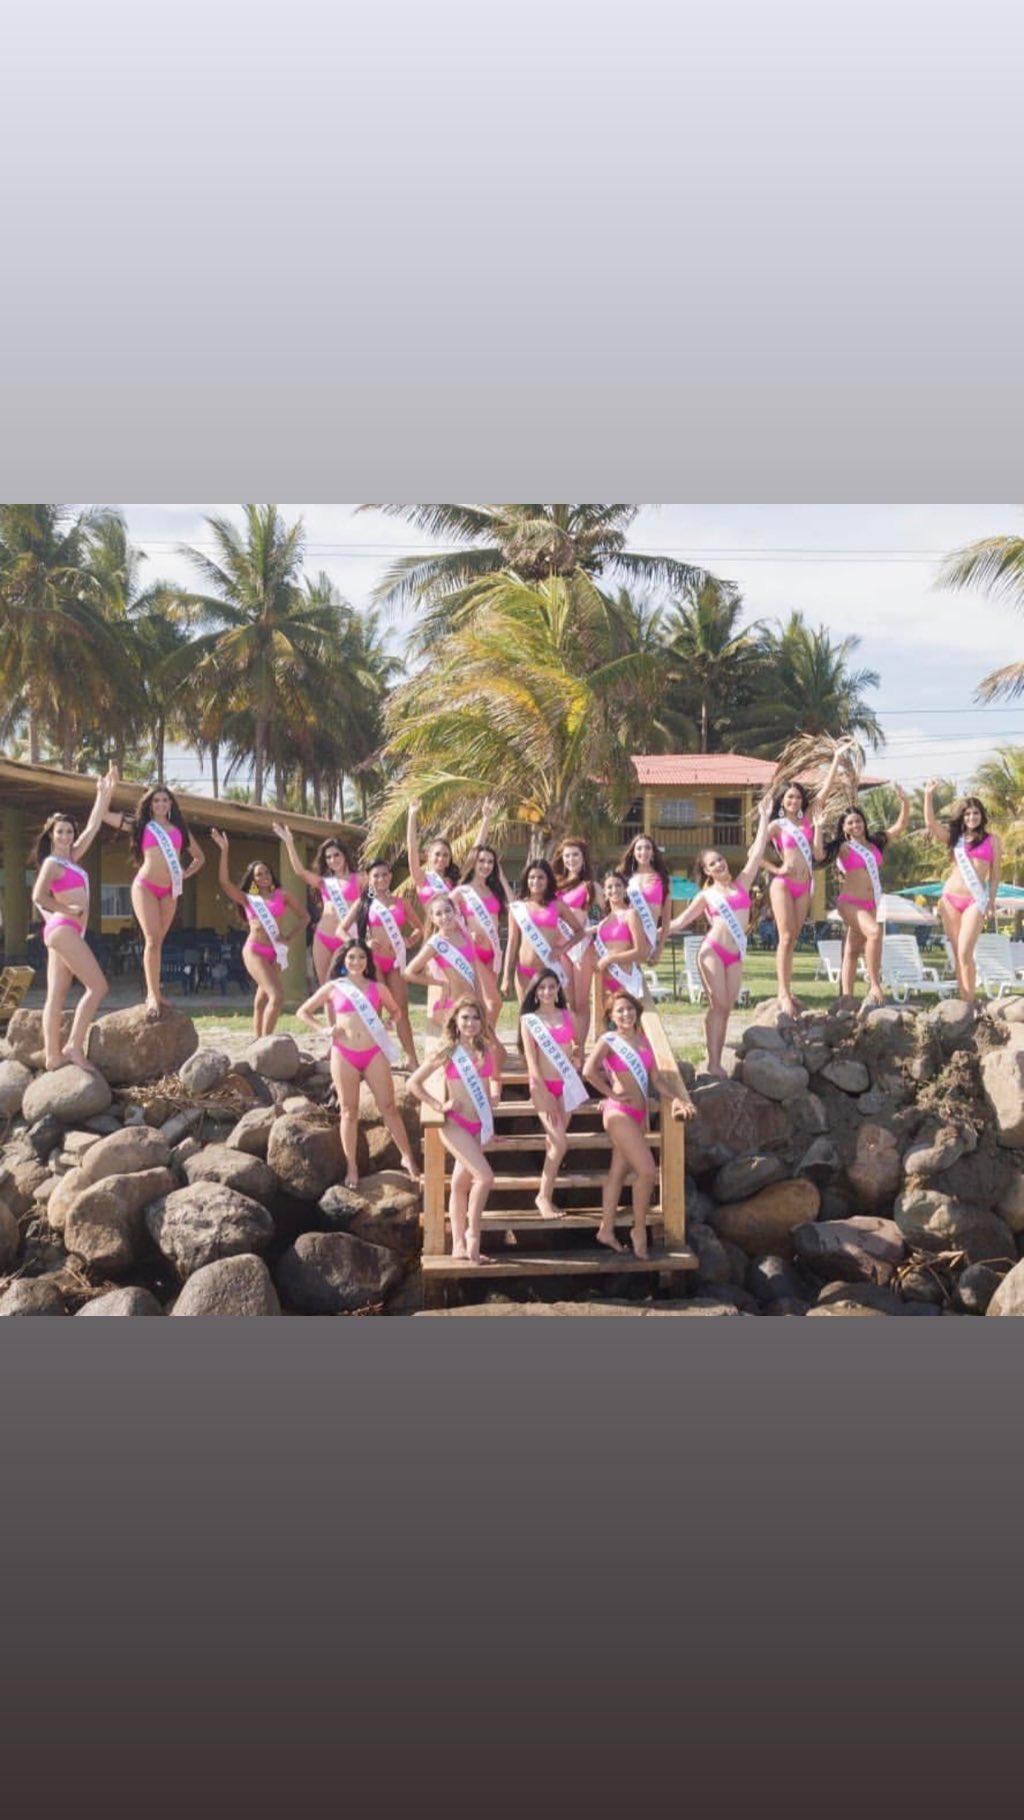 estefany frost, miss teen mundial latina usa 2019. - Página 4 60426210